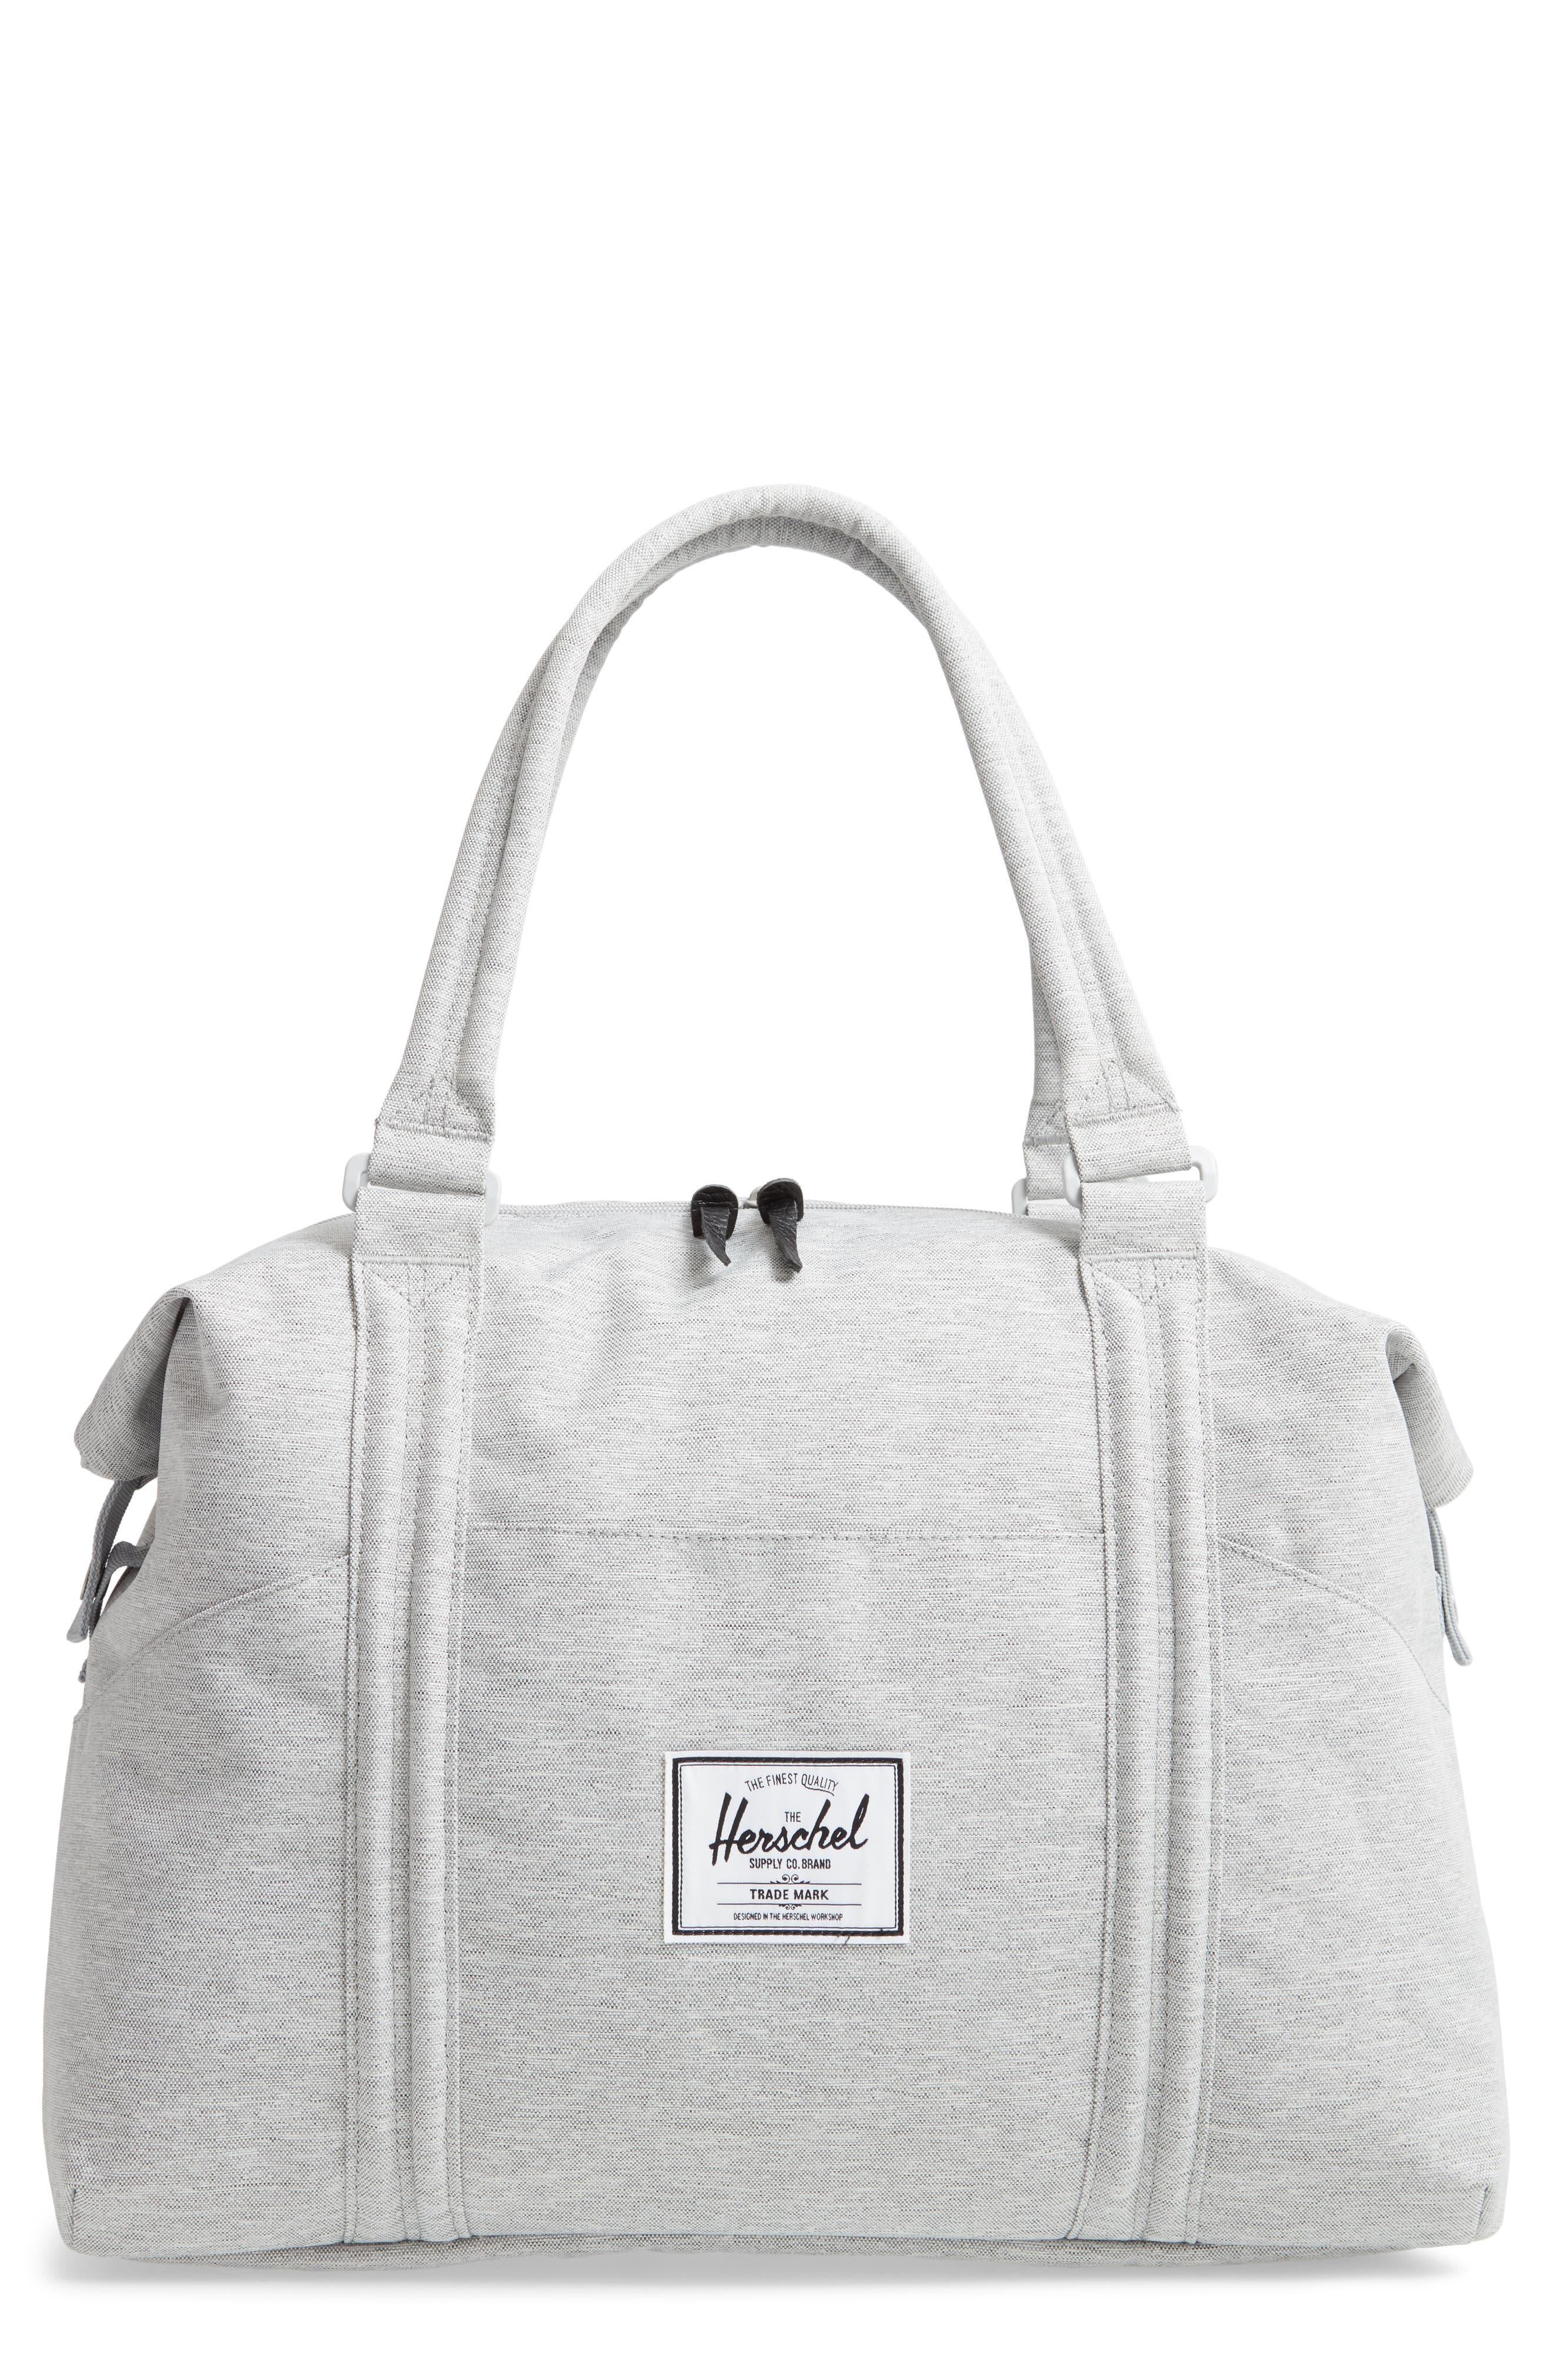 HERSCHEL SUPPLY CO. Strand Duffel Bag, Main, color, LIGHT GREY CROSSHATCH